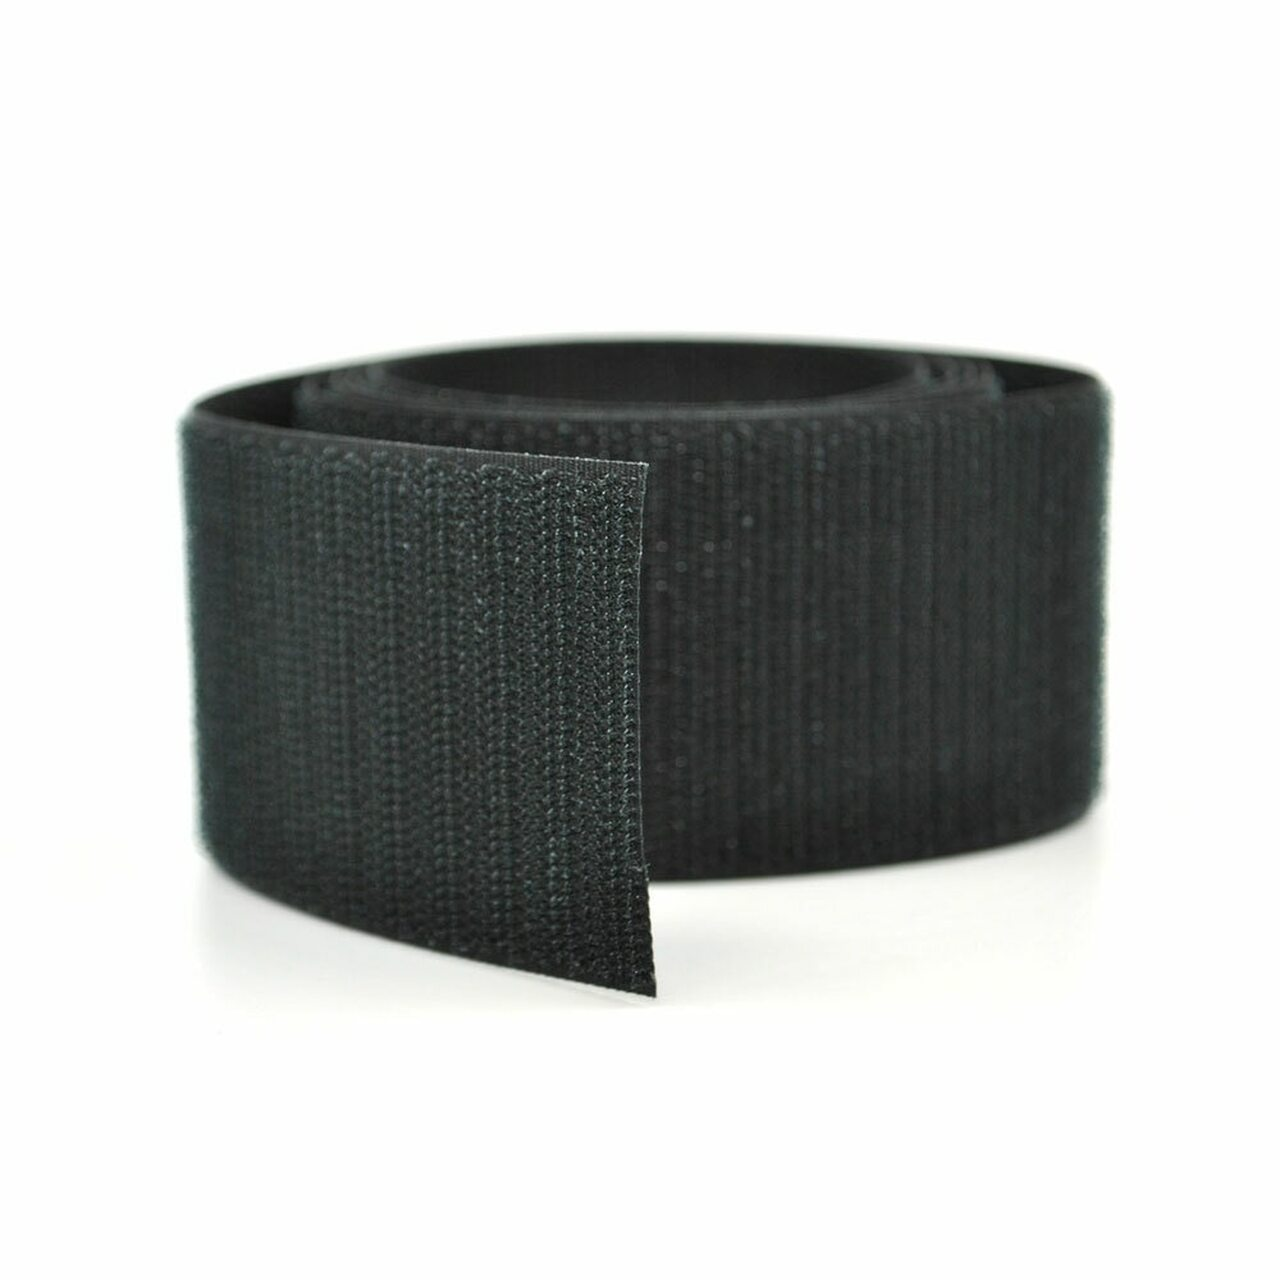 VELCRO Brand Polyester Sew-On Tape- Mil Spec Black Hook / Velcro Fasteners